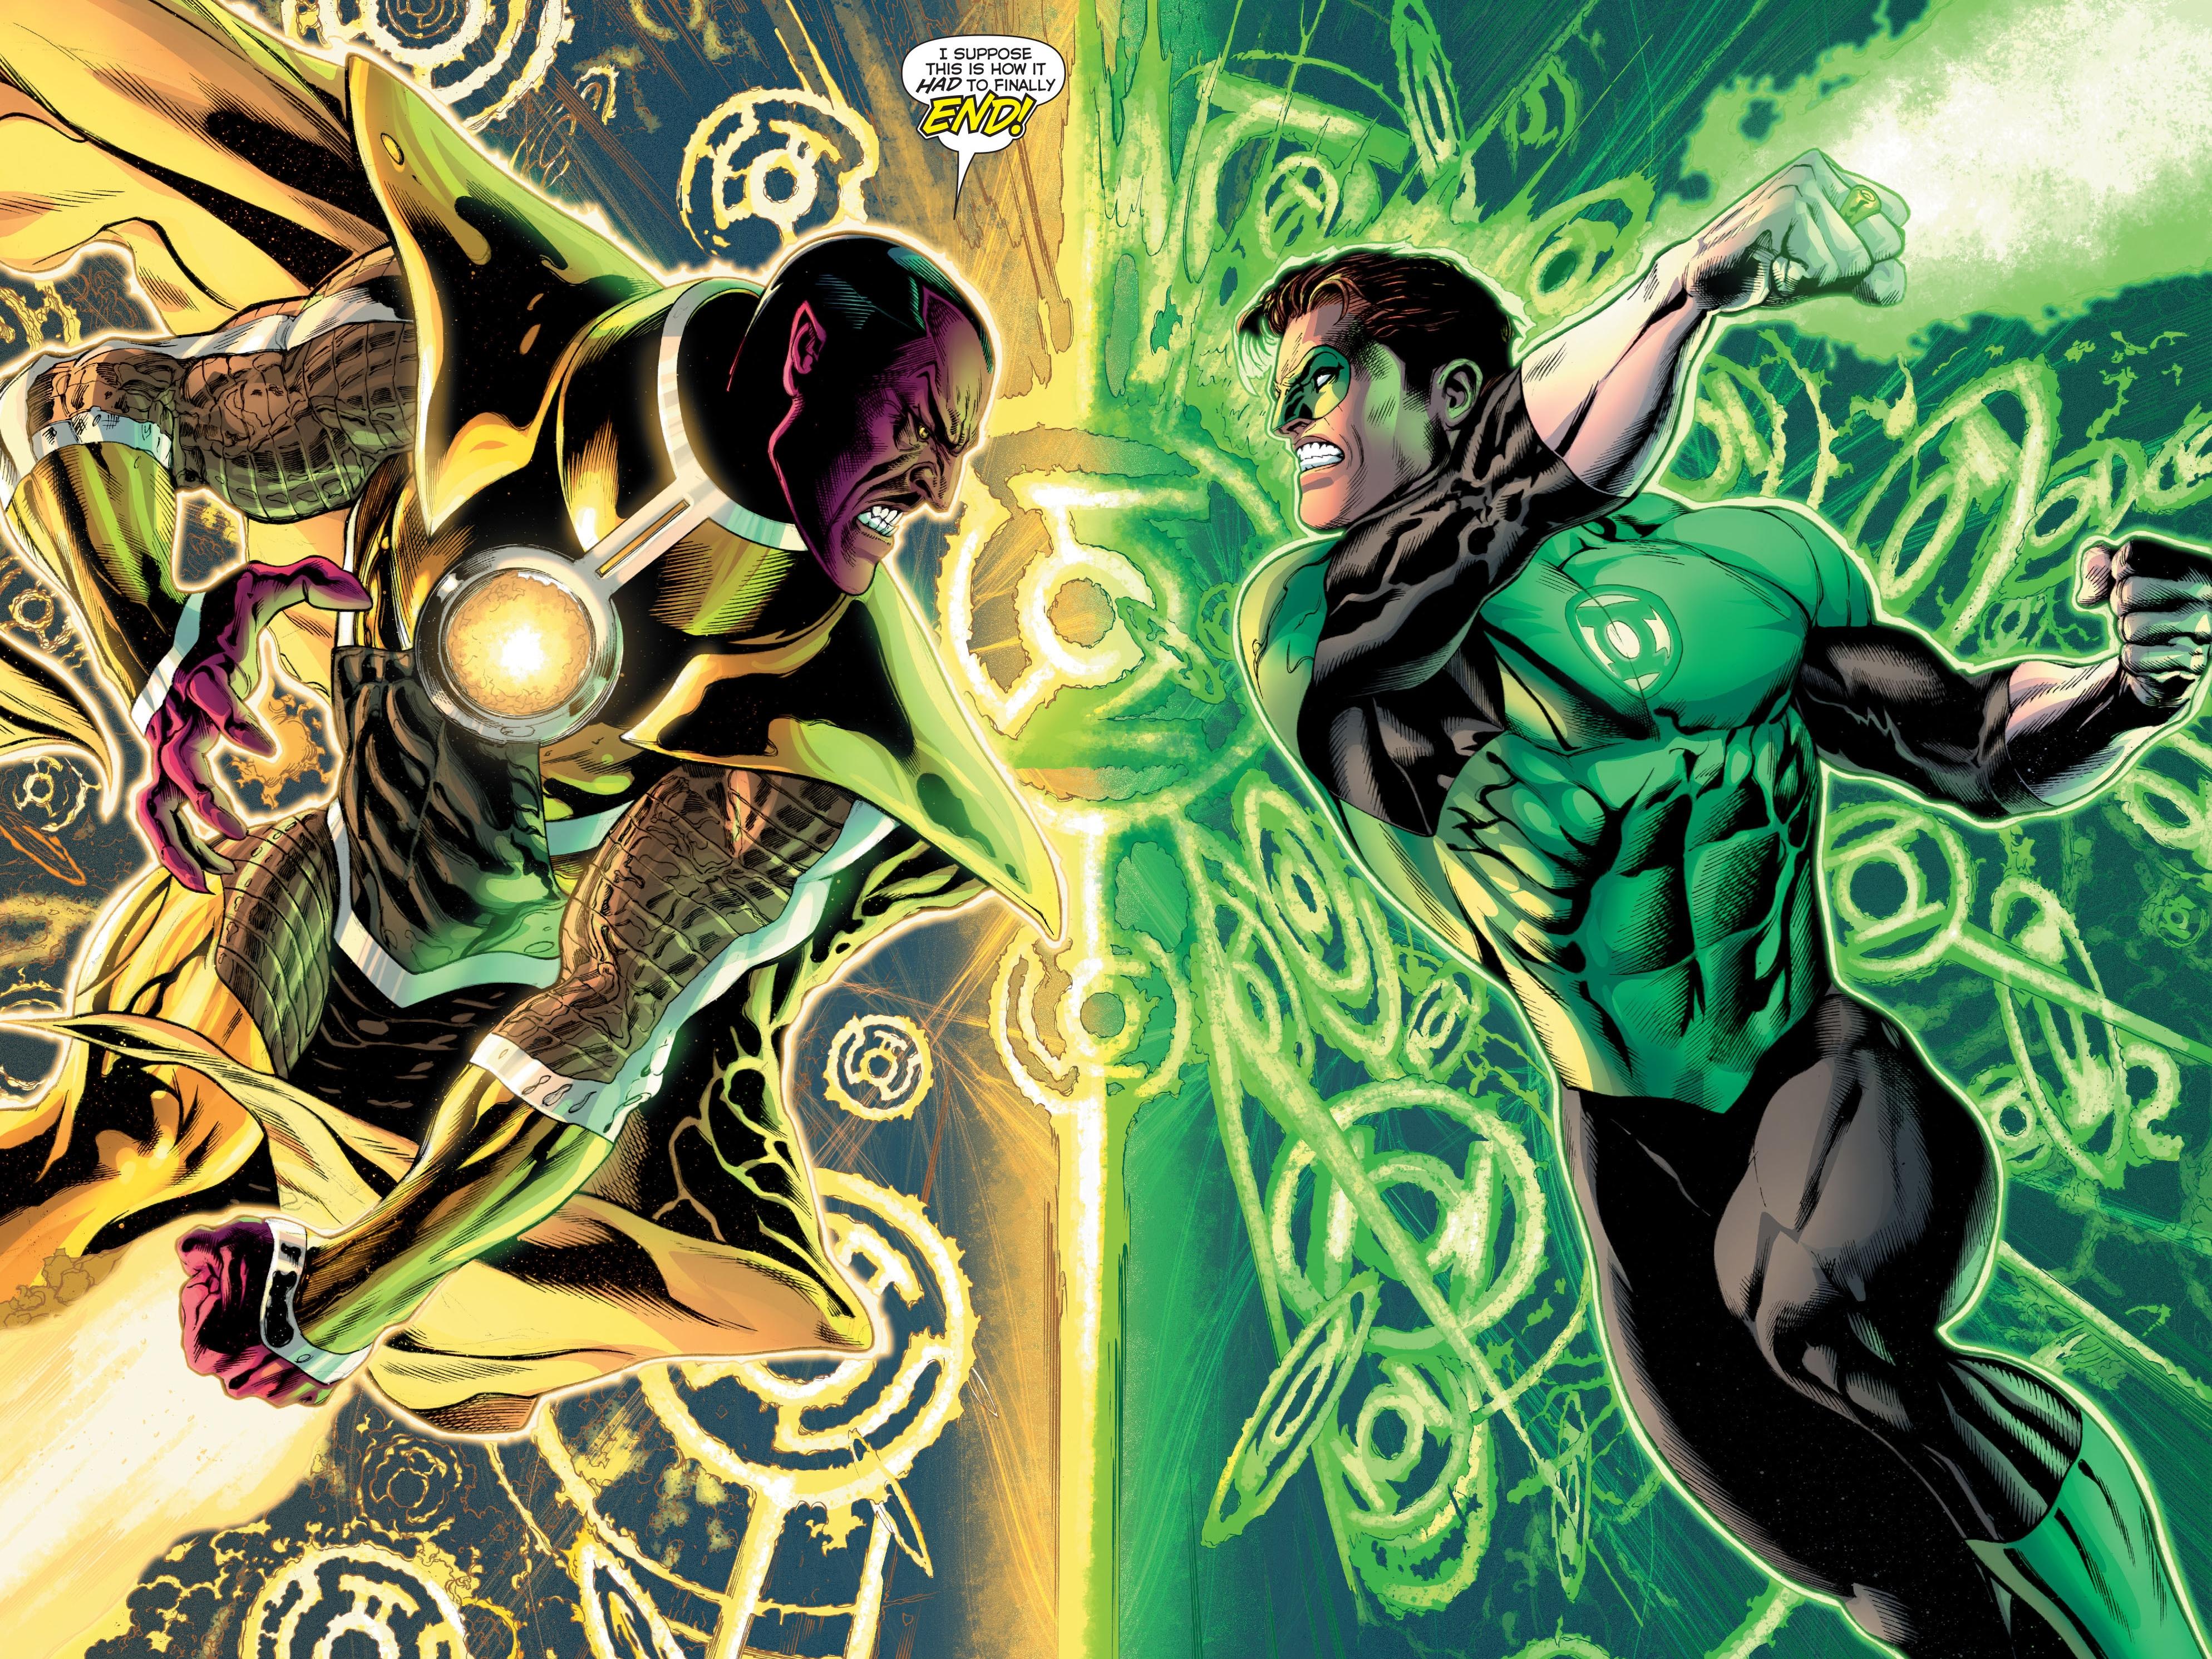 Lantern Corps Comic Comics Green Lantern Corps Superhero Wallpaper 3975x2981